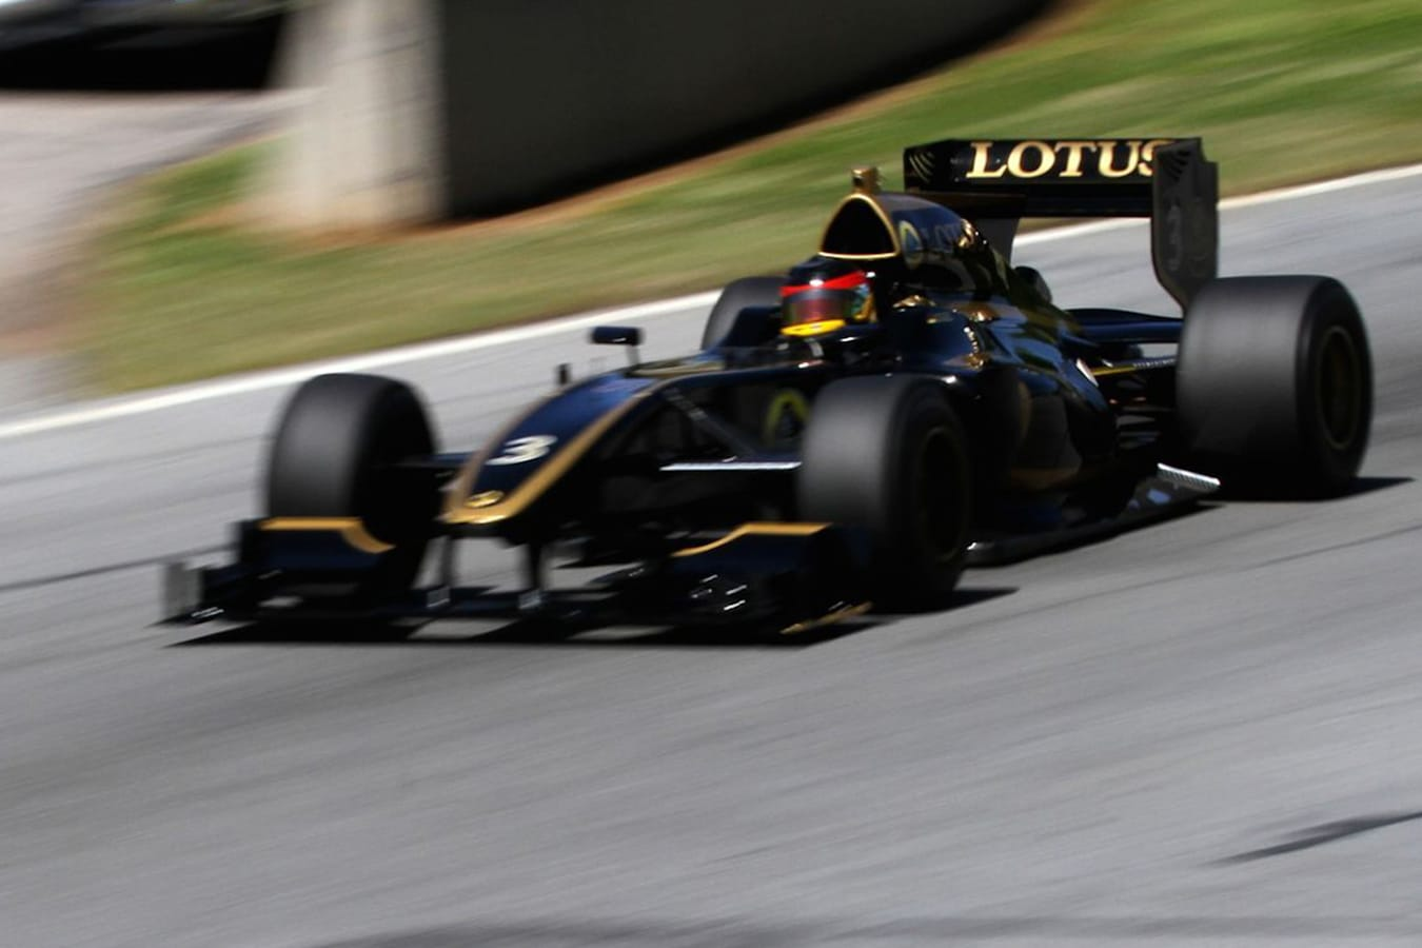 Lotus F 1 Jpg